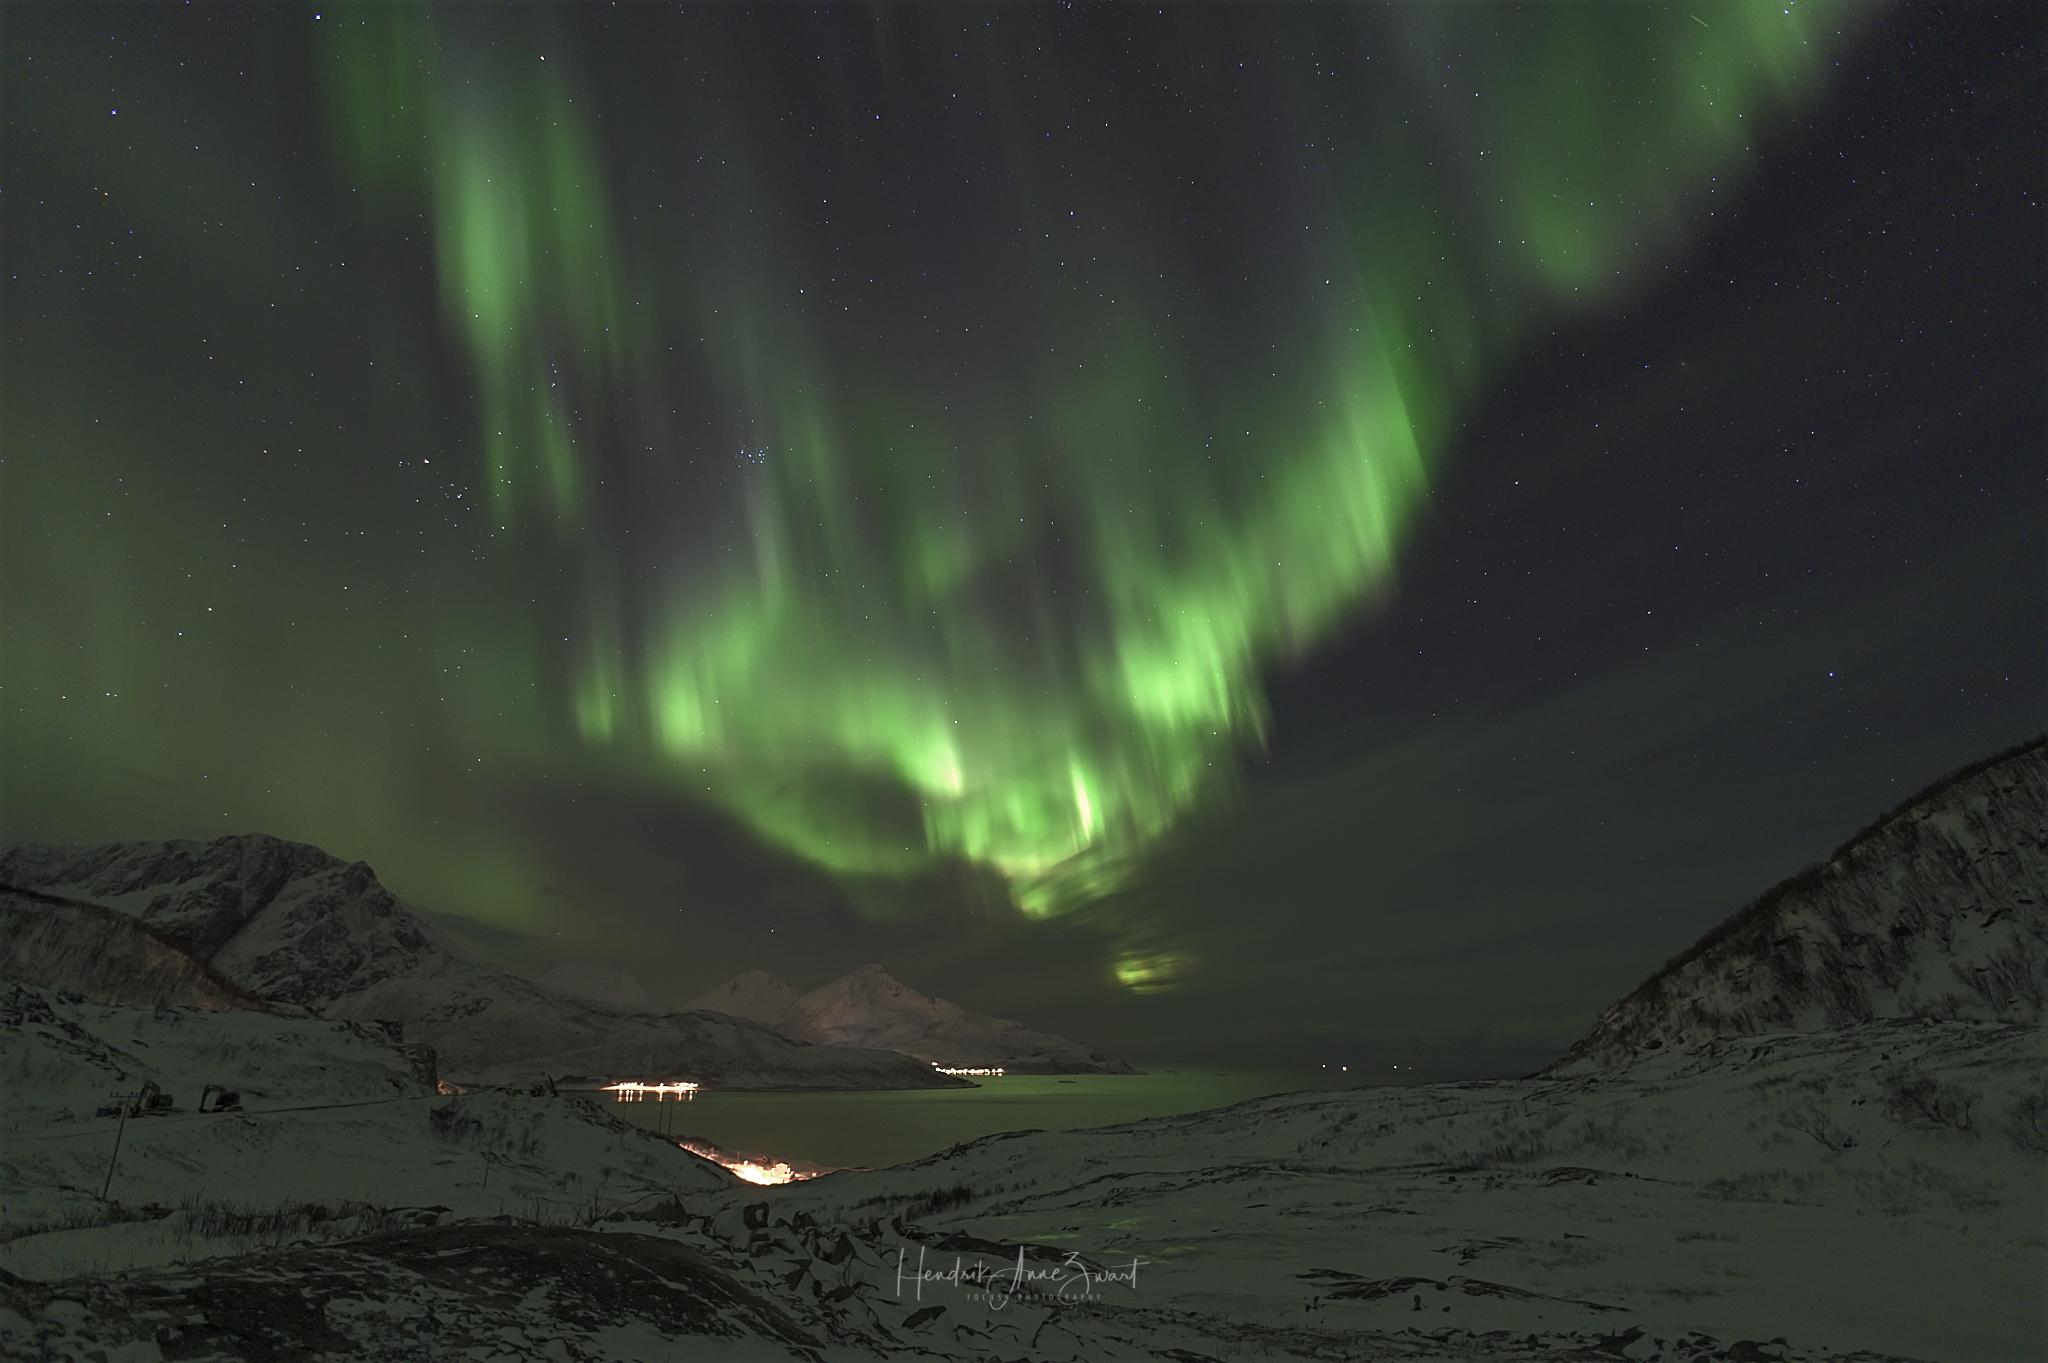 Nordic_Light_Northern_Lights_Kvaloya_3.jpg